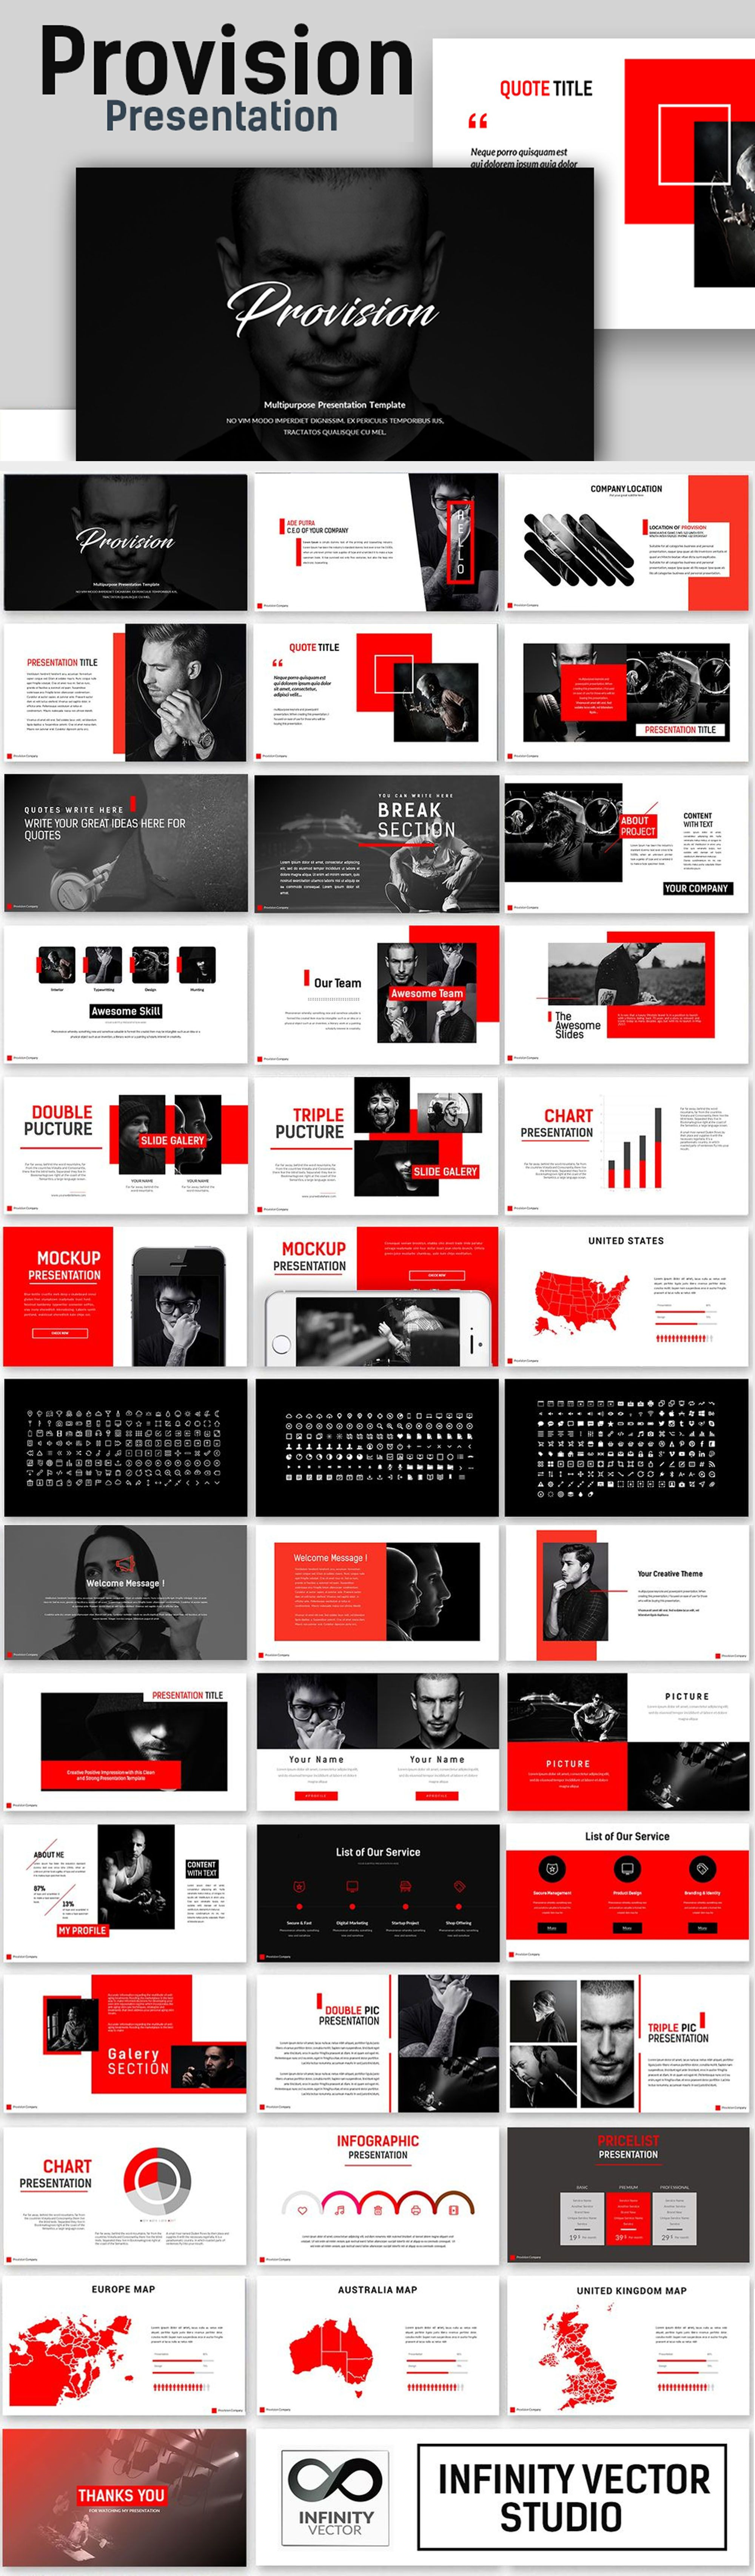 Provision Creative Presentation PowerPoint Template | Music